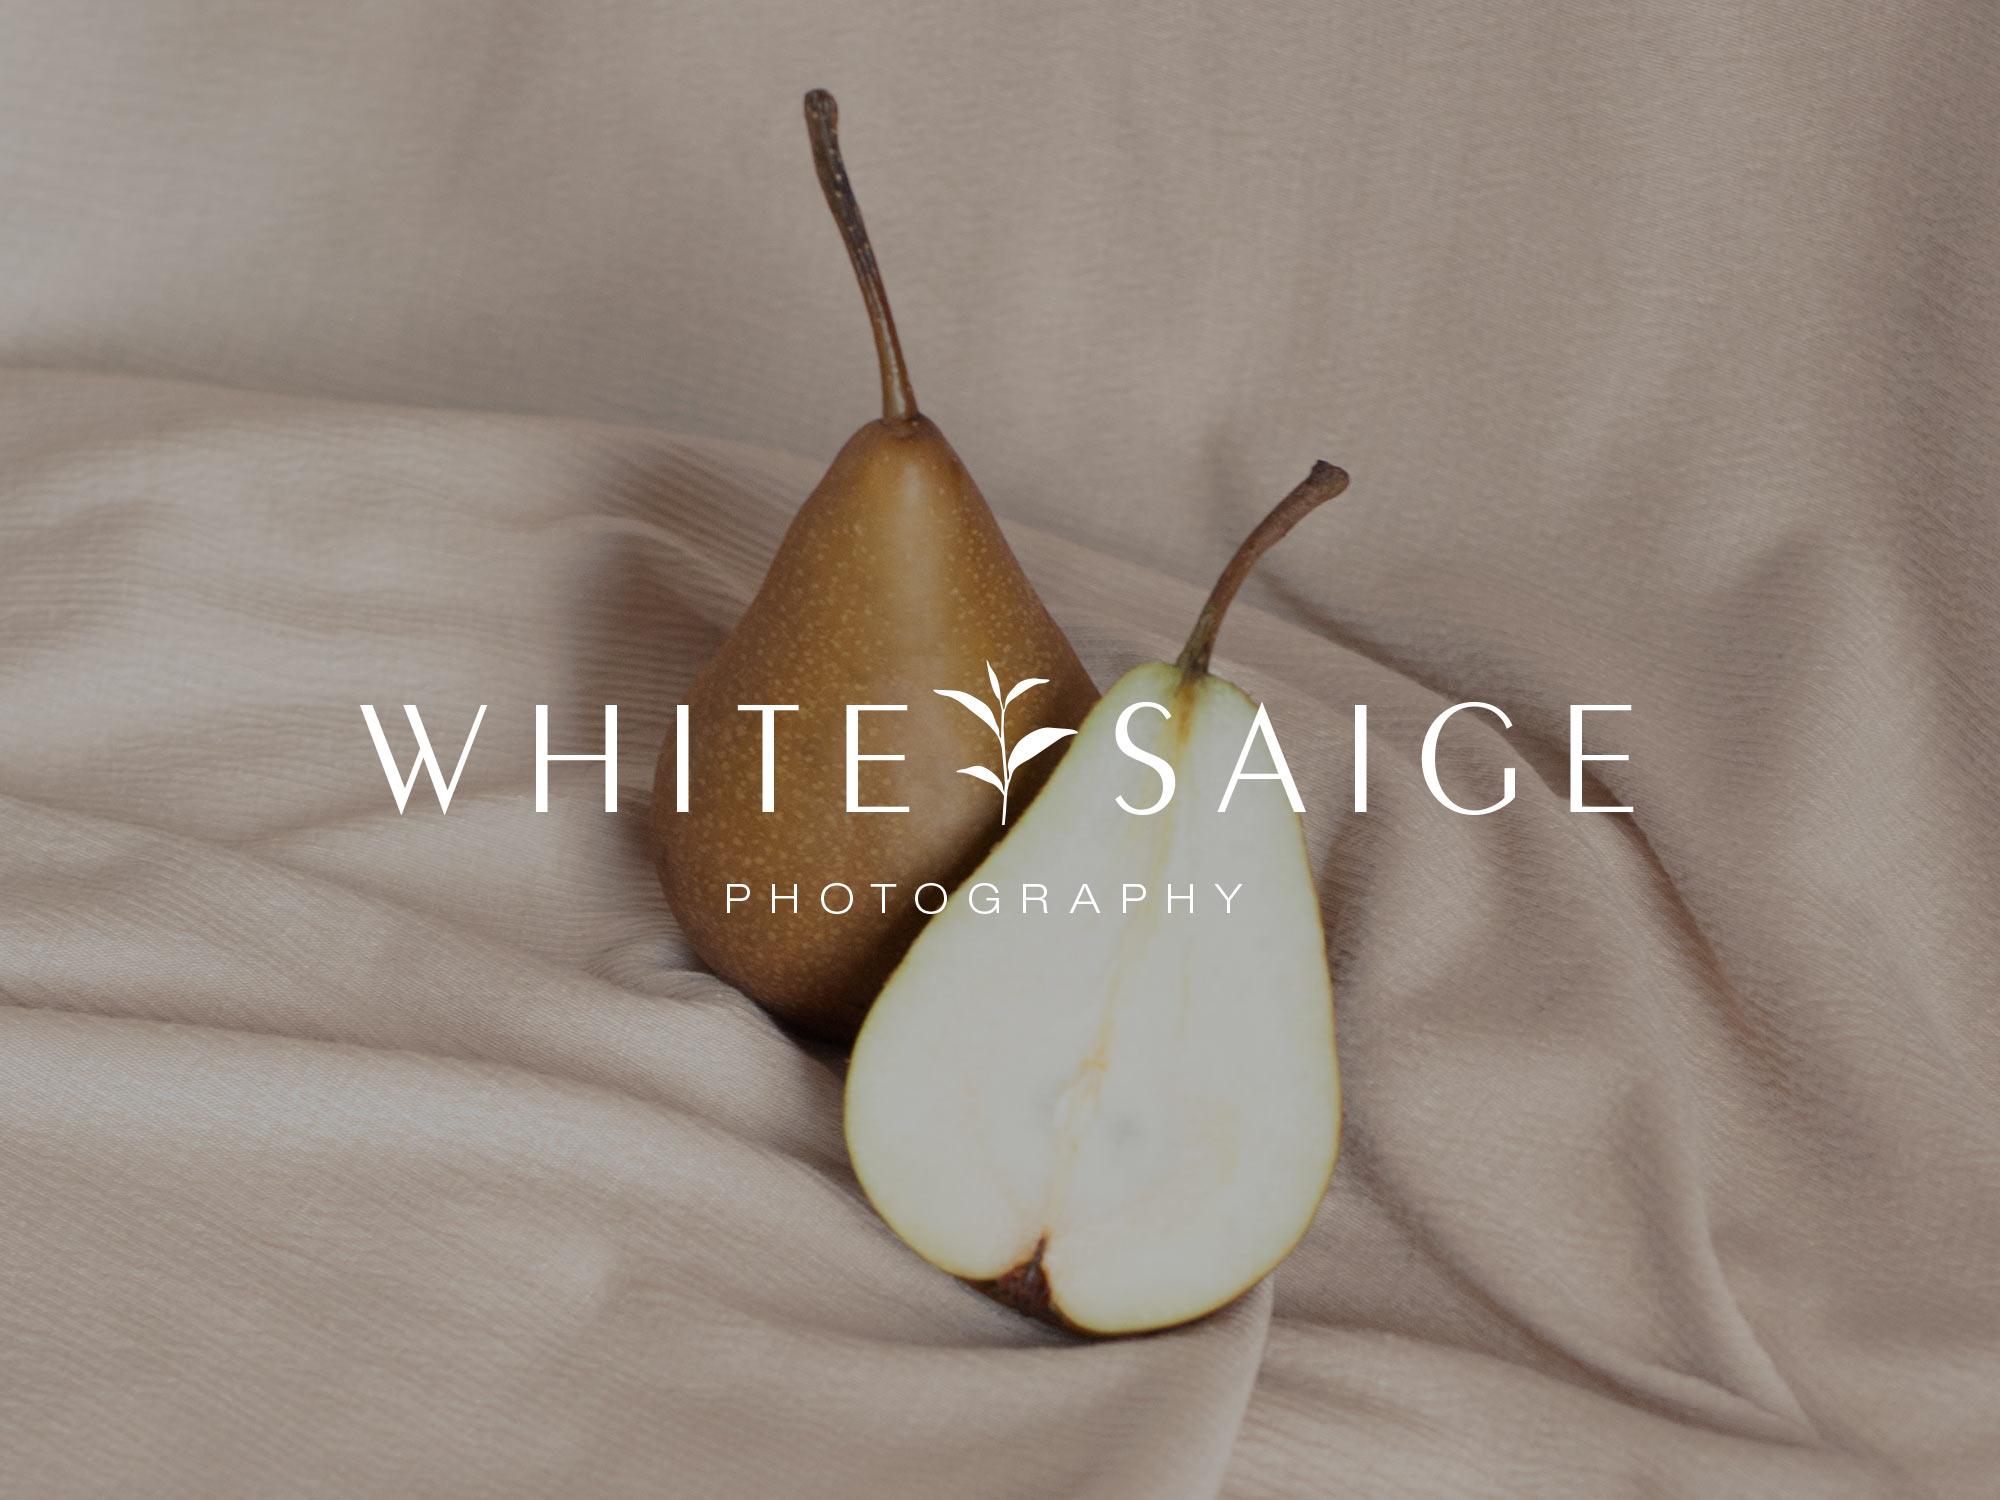 WhiteSaige1.jpg